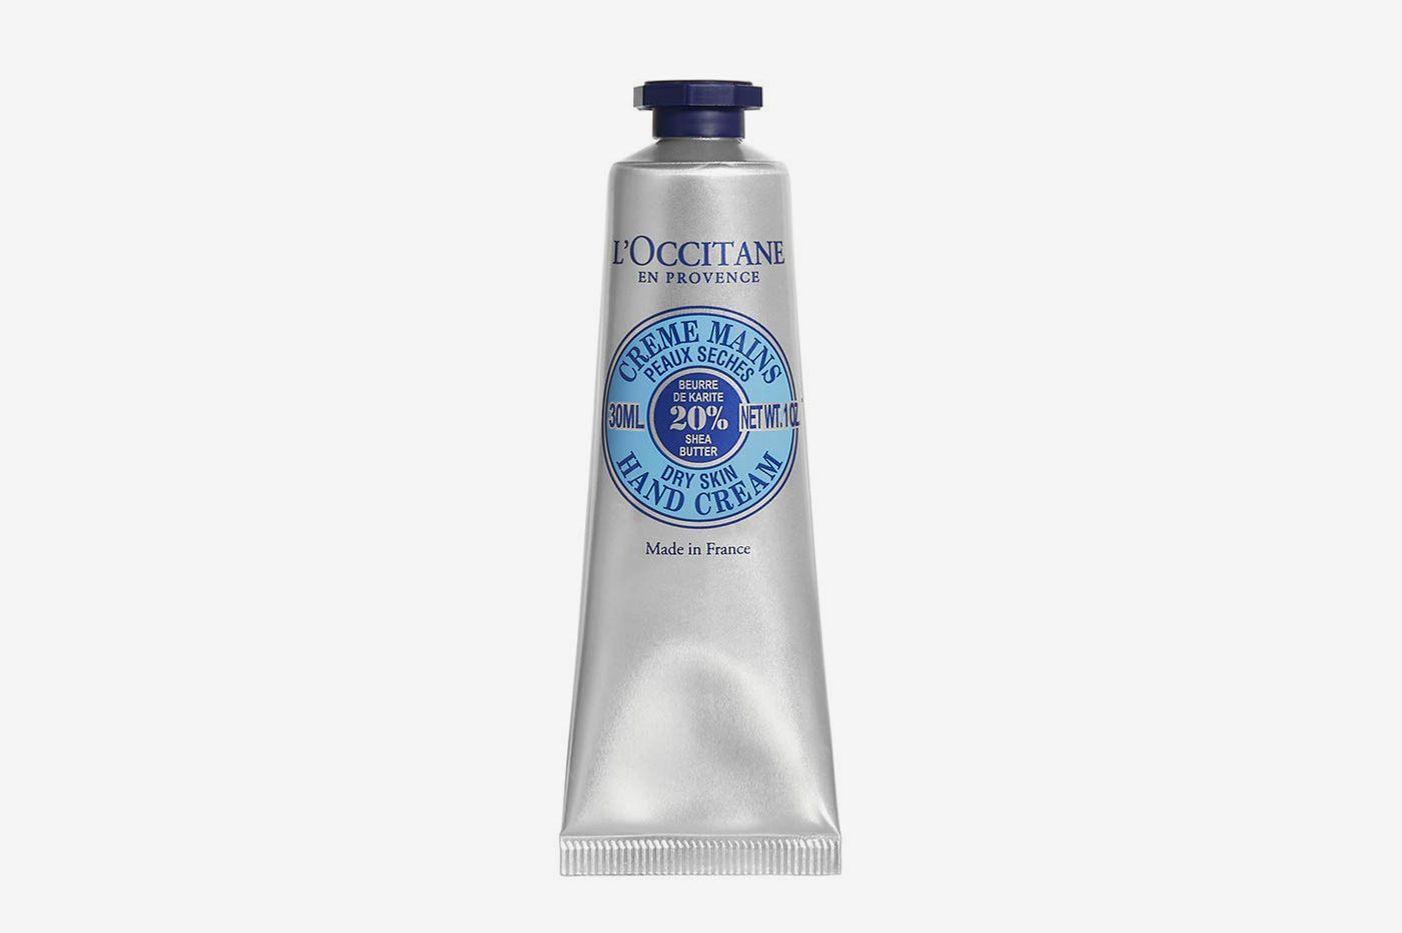 L'Occitane Shea Butter Hand Cream